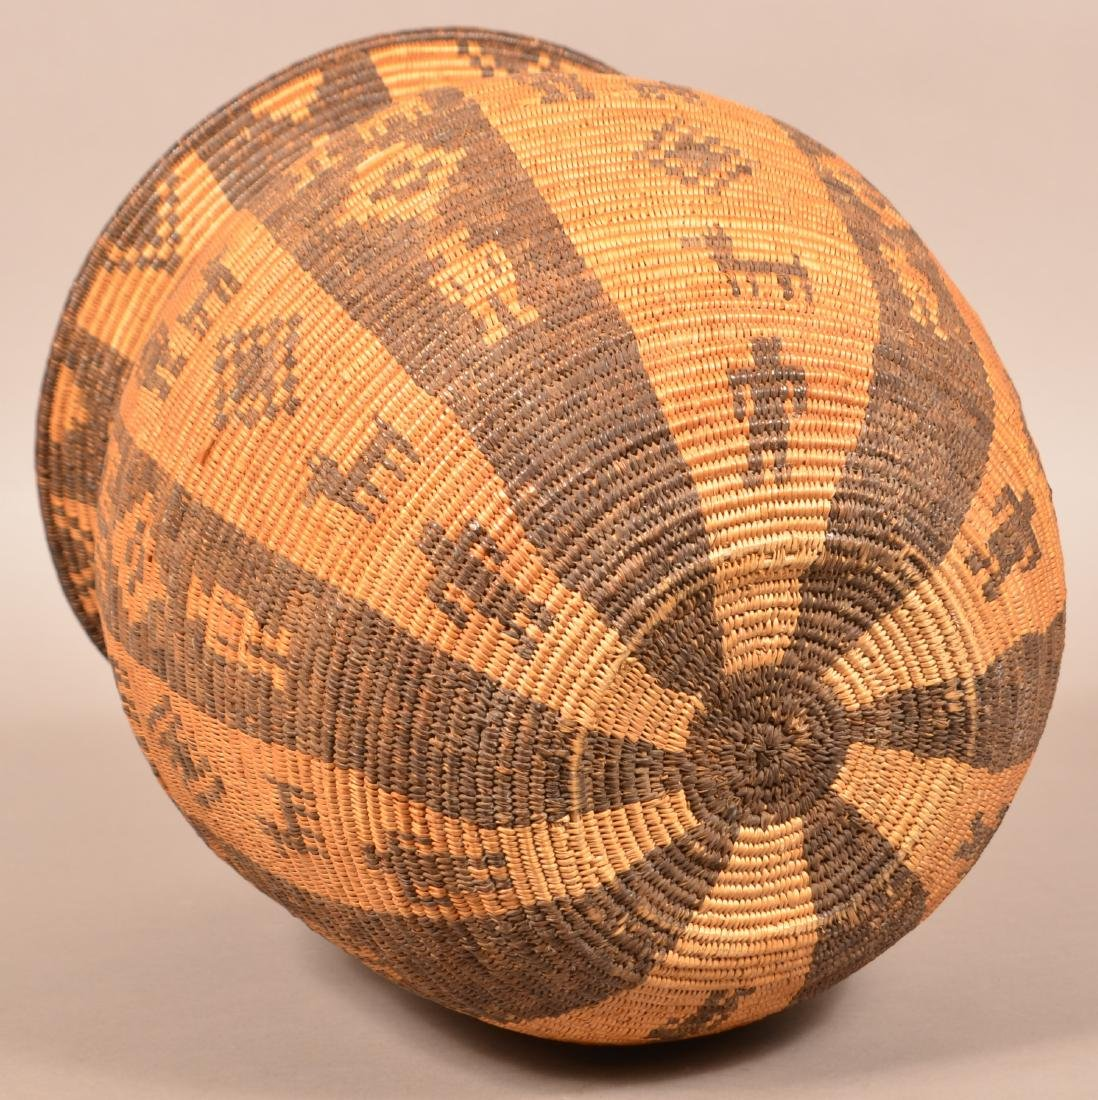 Antique Apache Indian Coiled Storage Basket w/ Design - 5